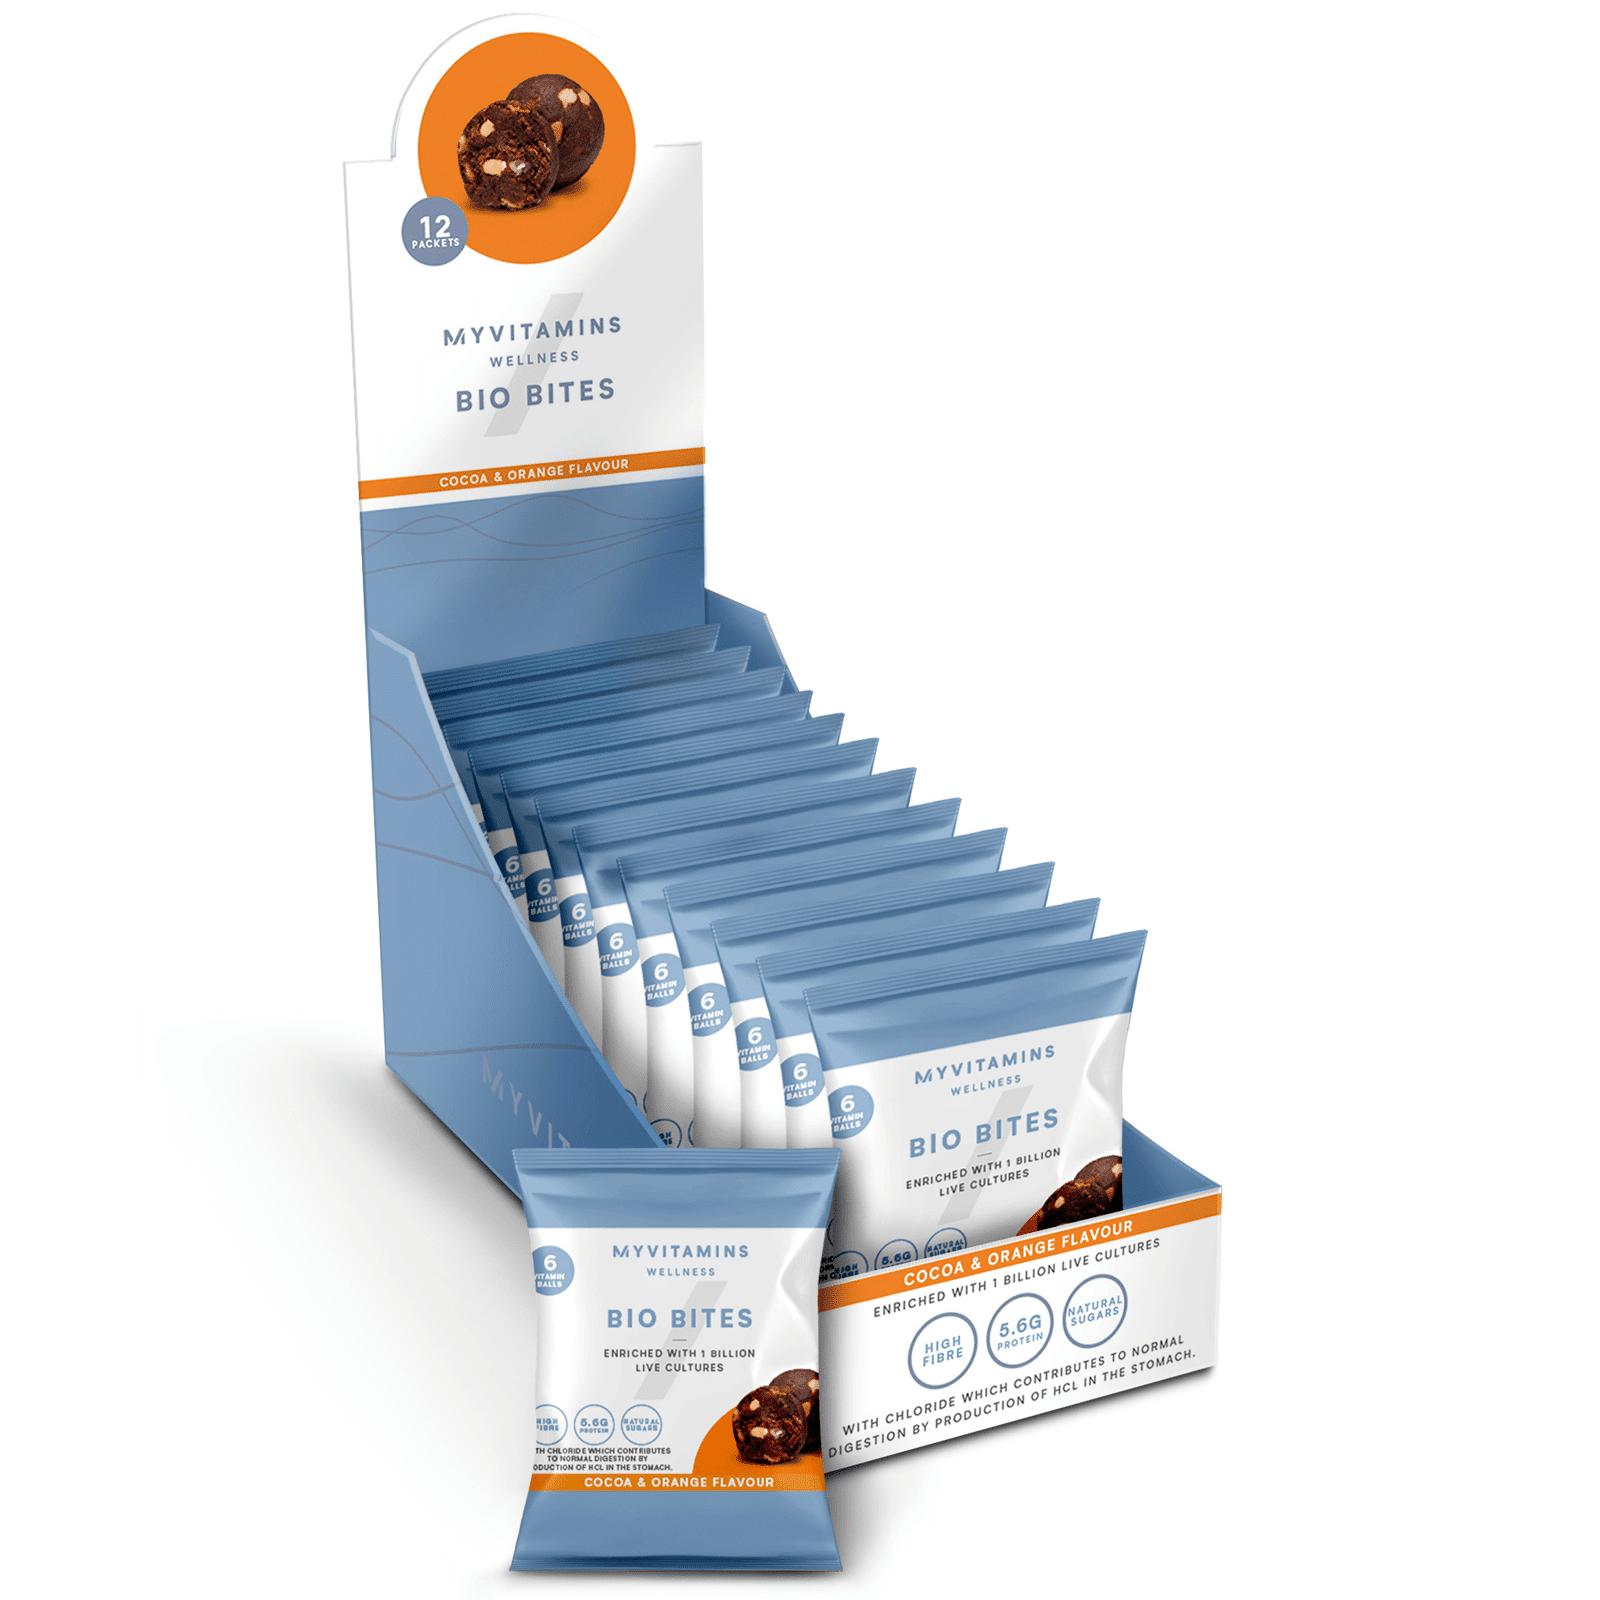 Myvitamins Bio Bites - Cocoa & Orange